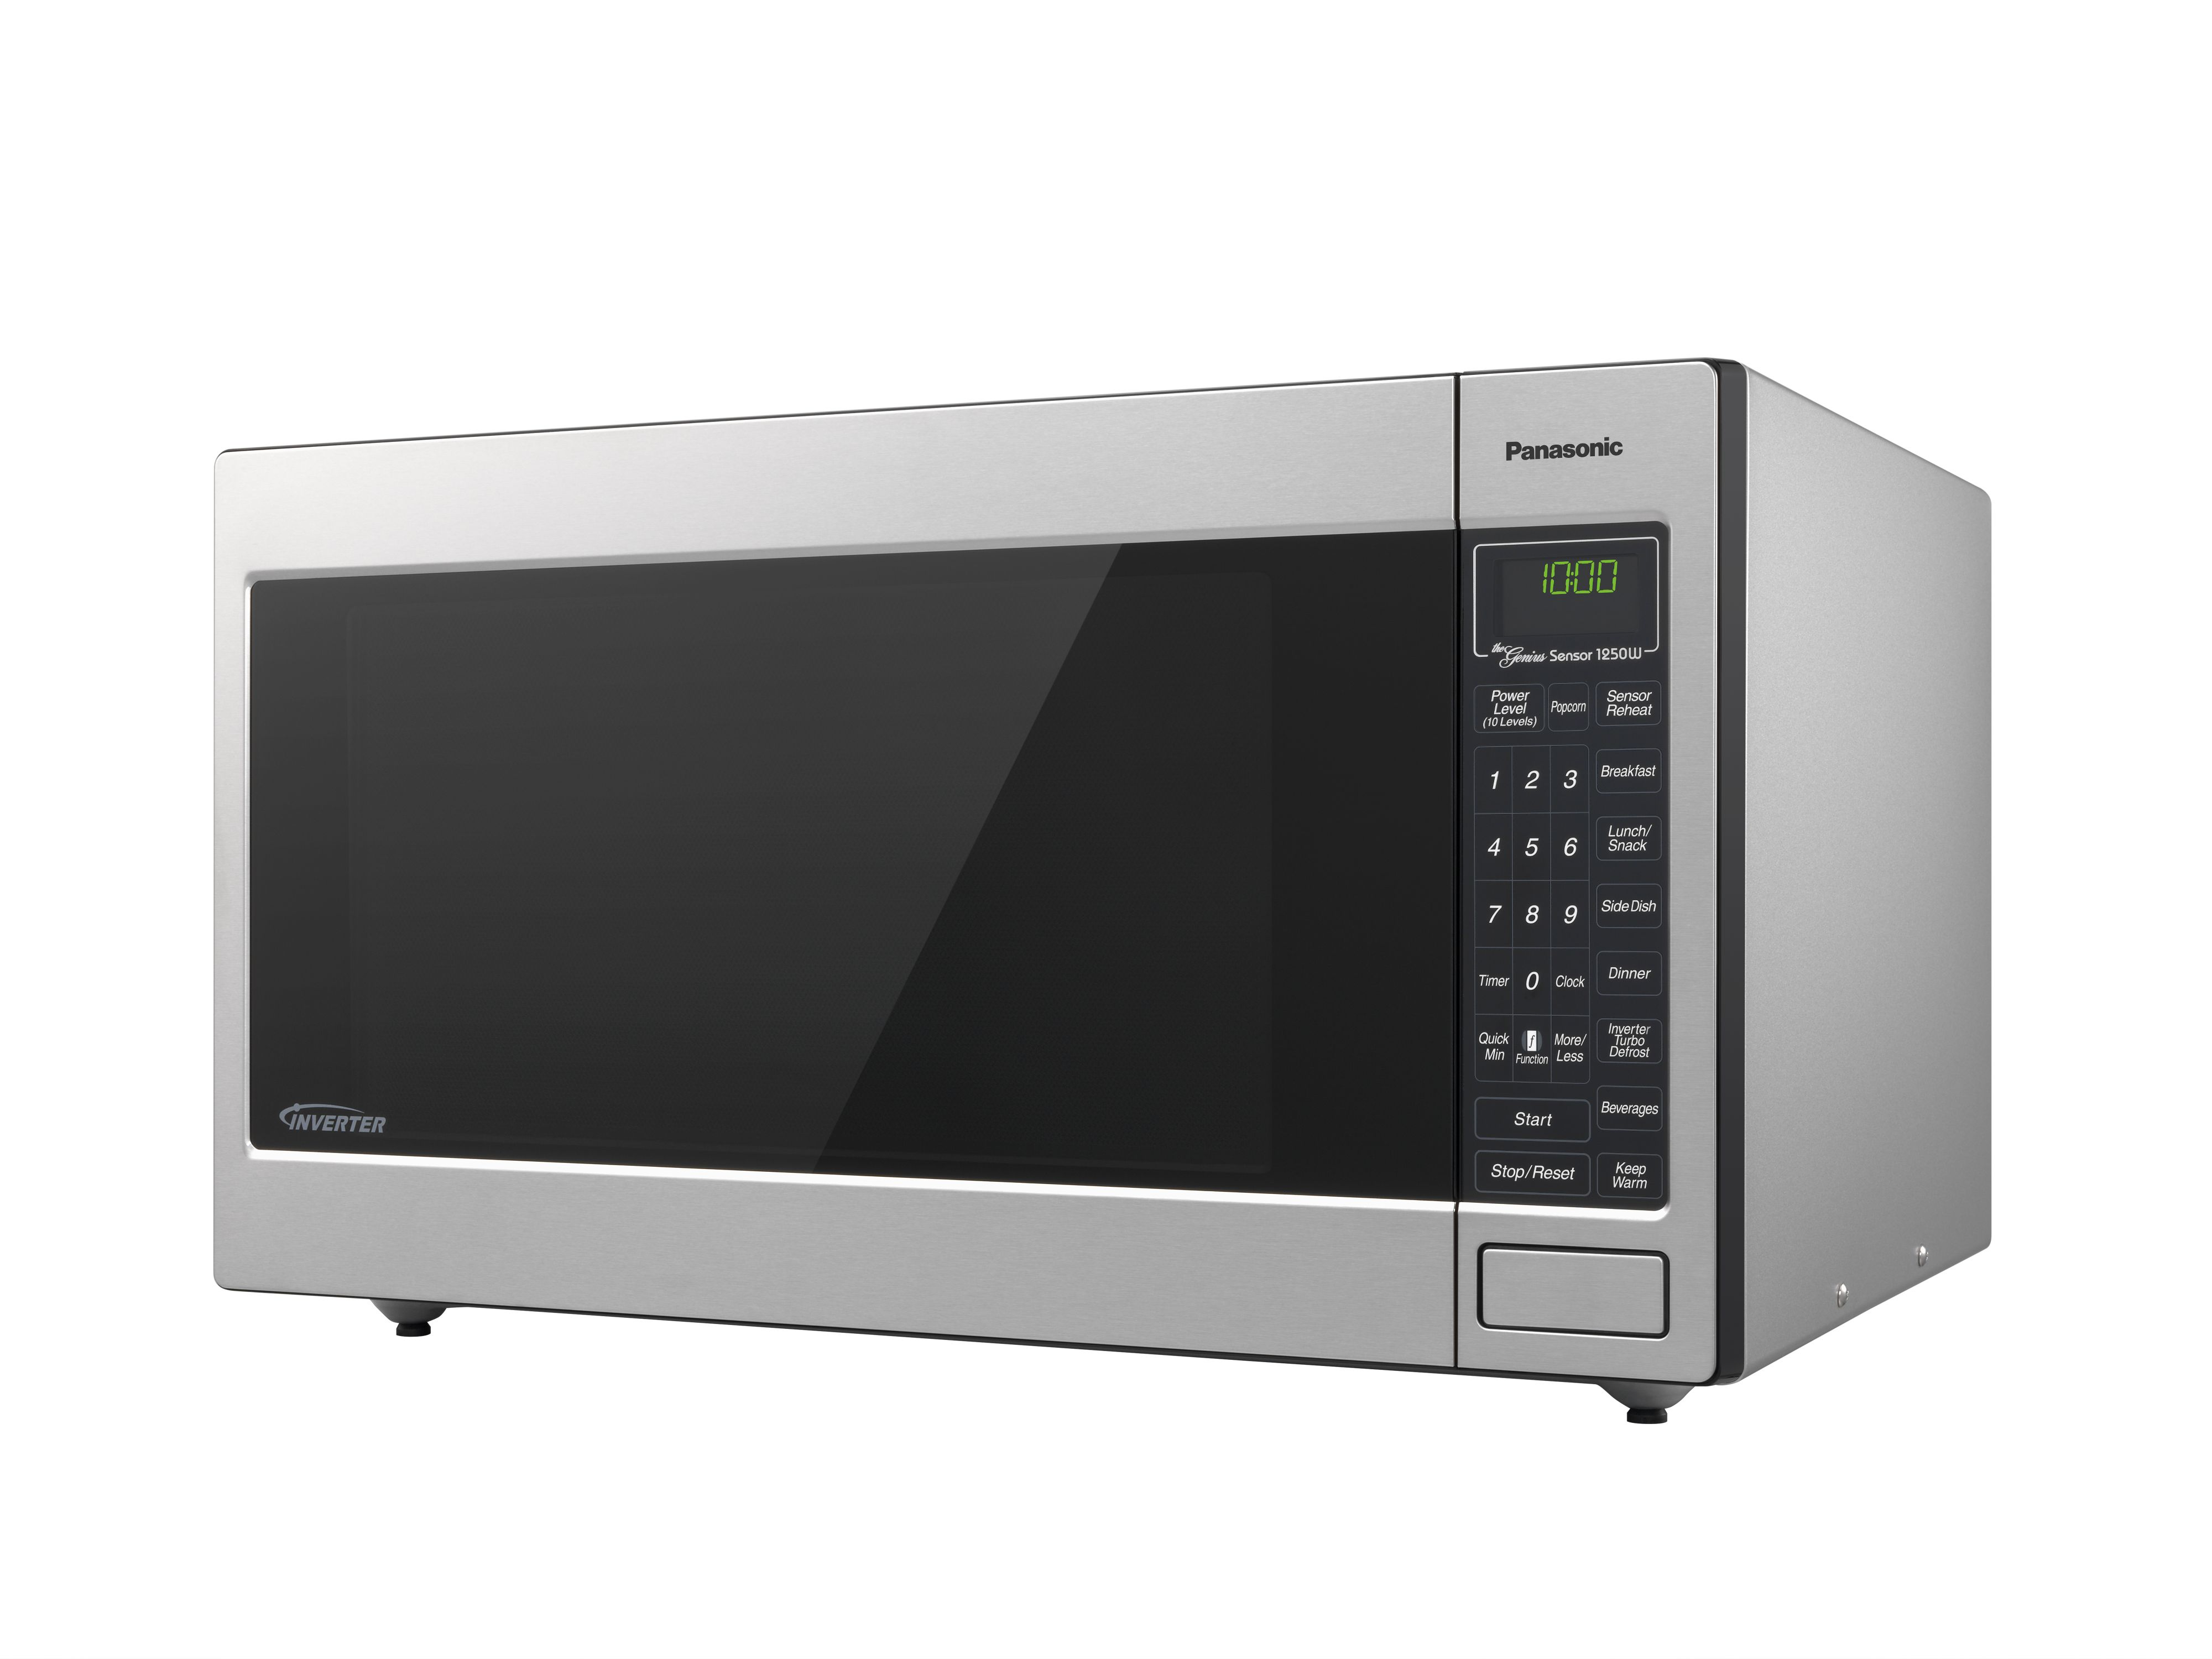 Panasonic 2 Cu Ft 1250 Watt Microwave Oven Stainless Steel